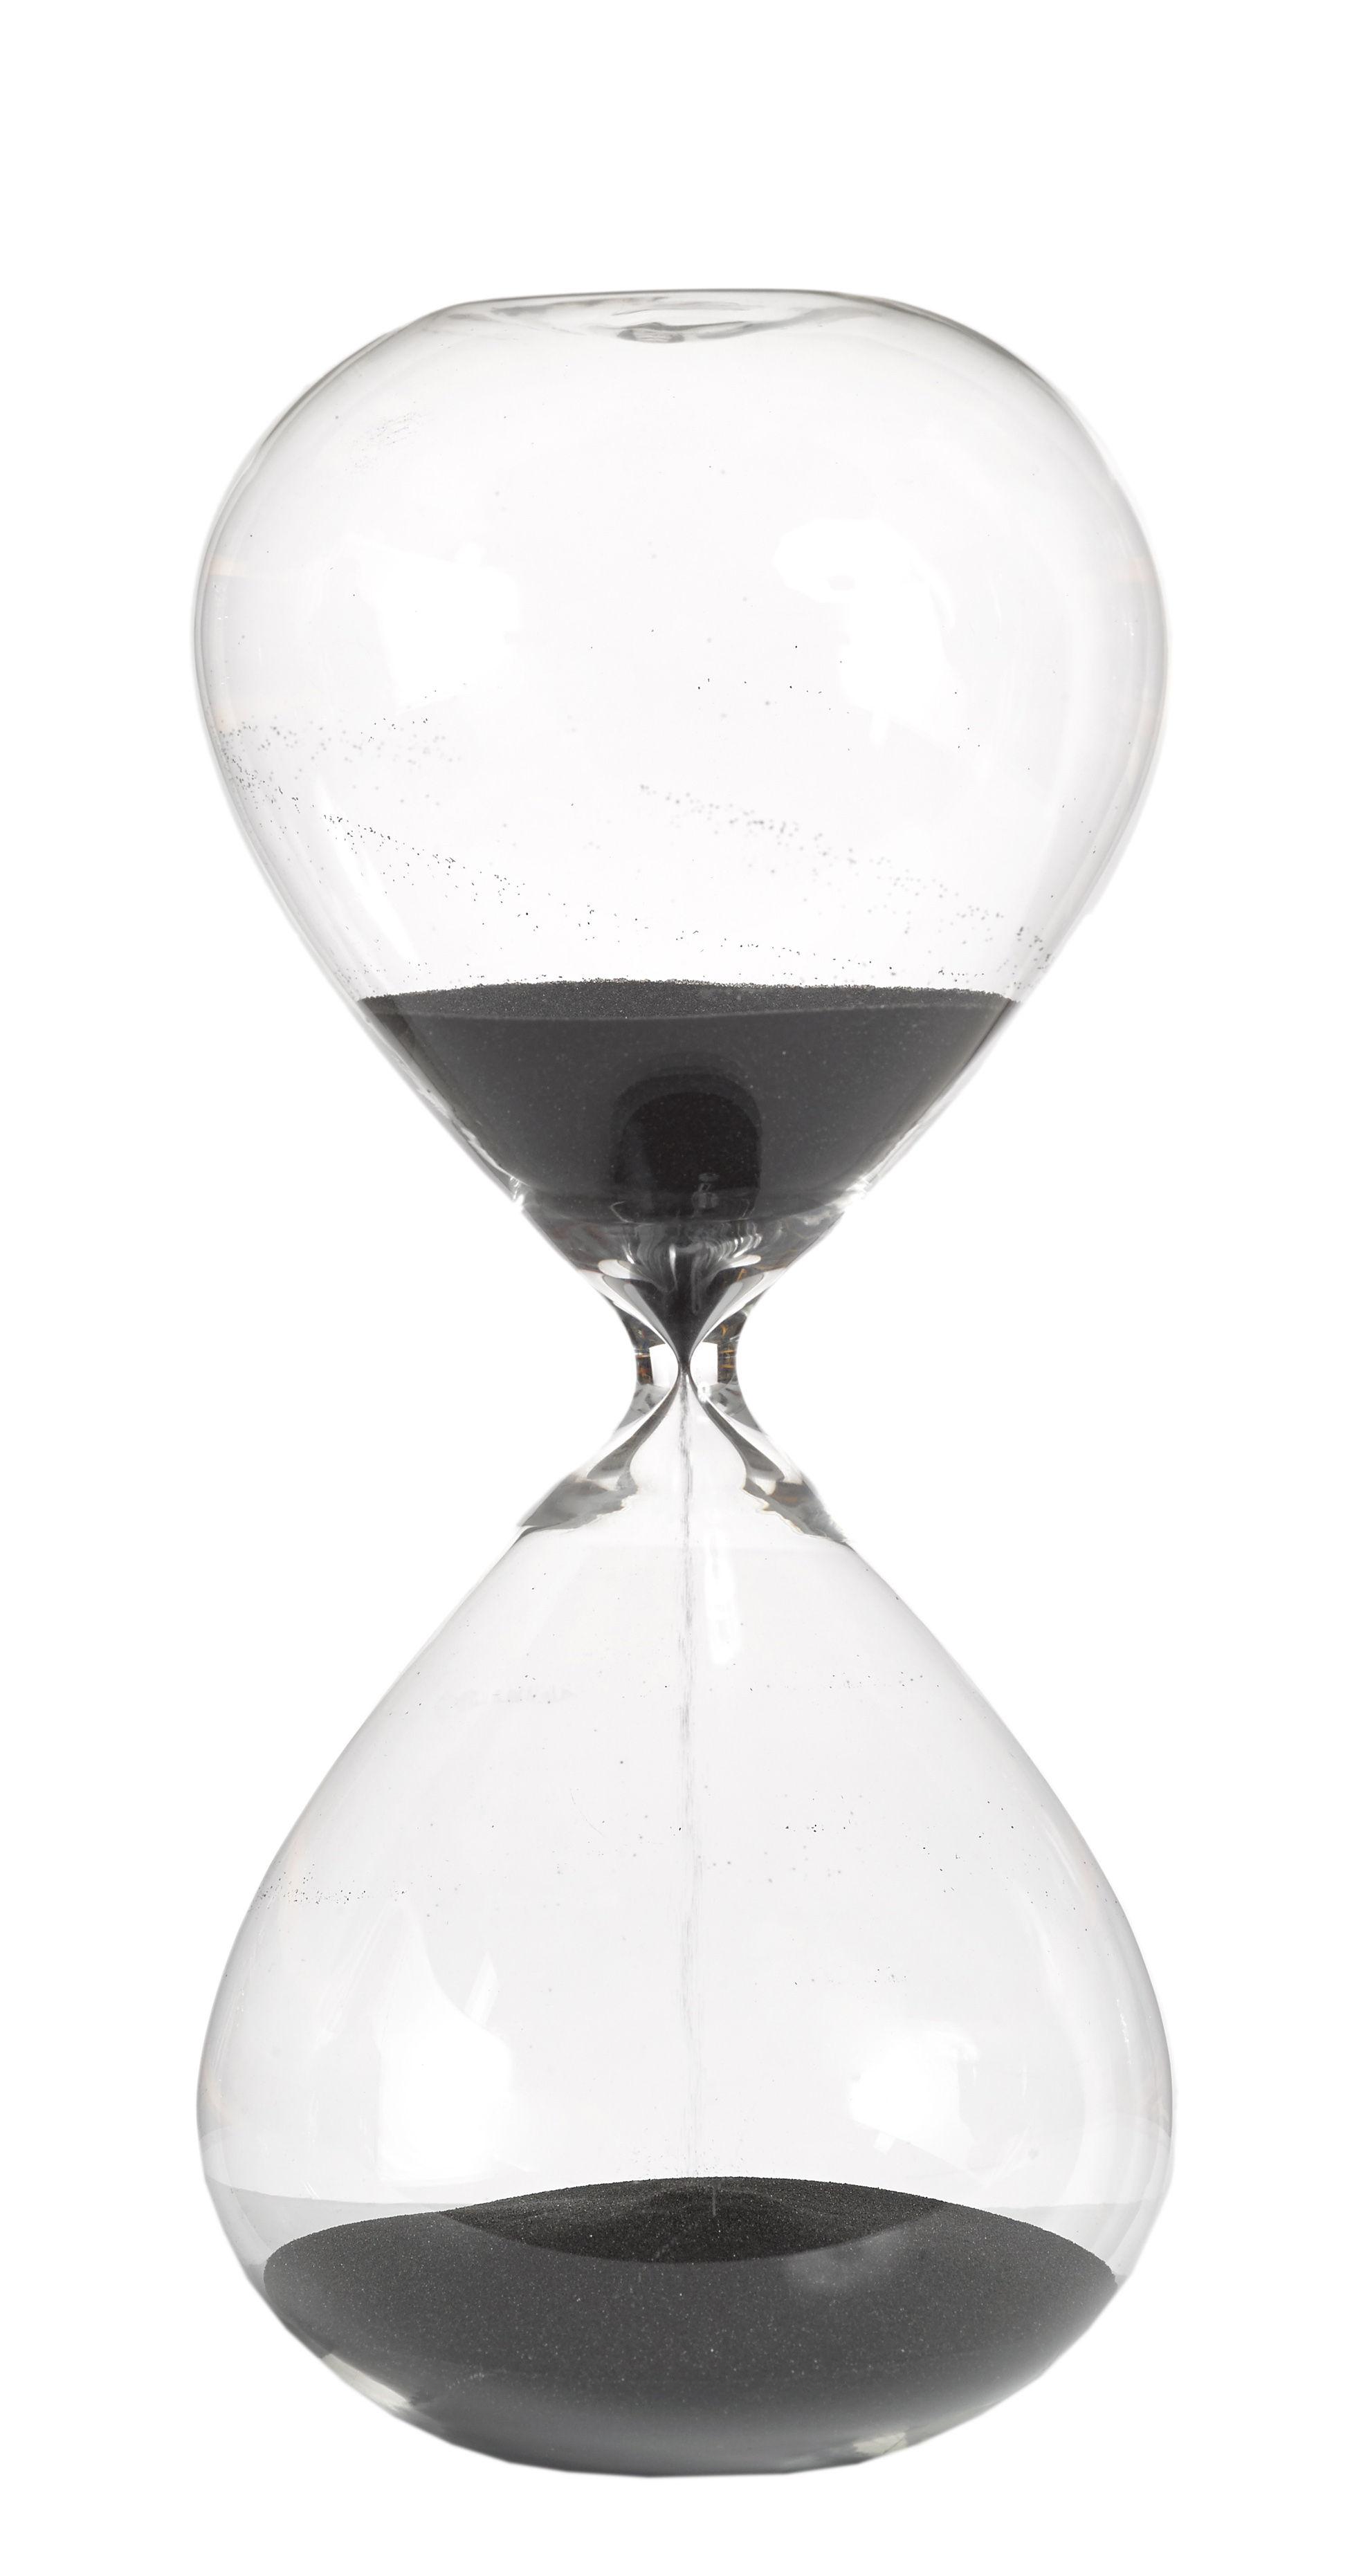 Decoration - Home Accessories - Ball Medium Egg timer - / 90 min - H 30 cm by Pols Potten - Transparent & Black - Glass